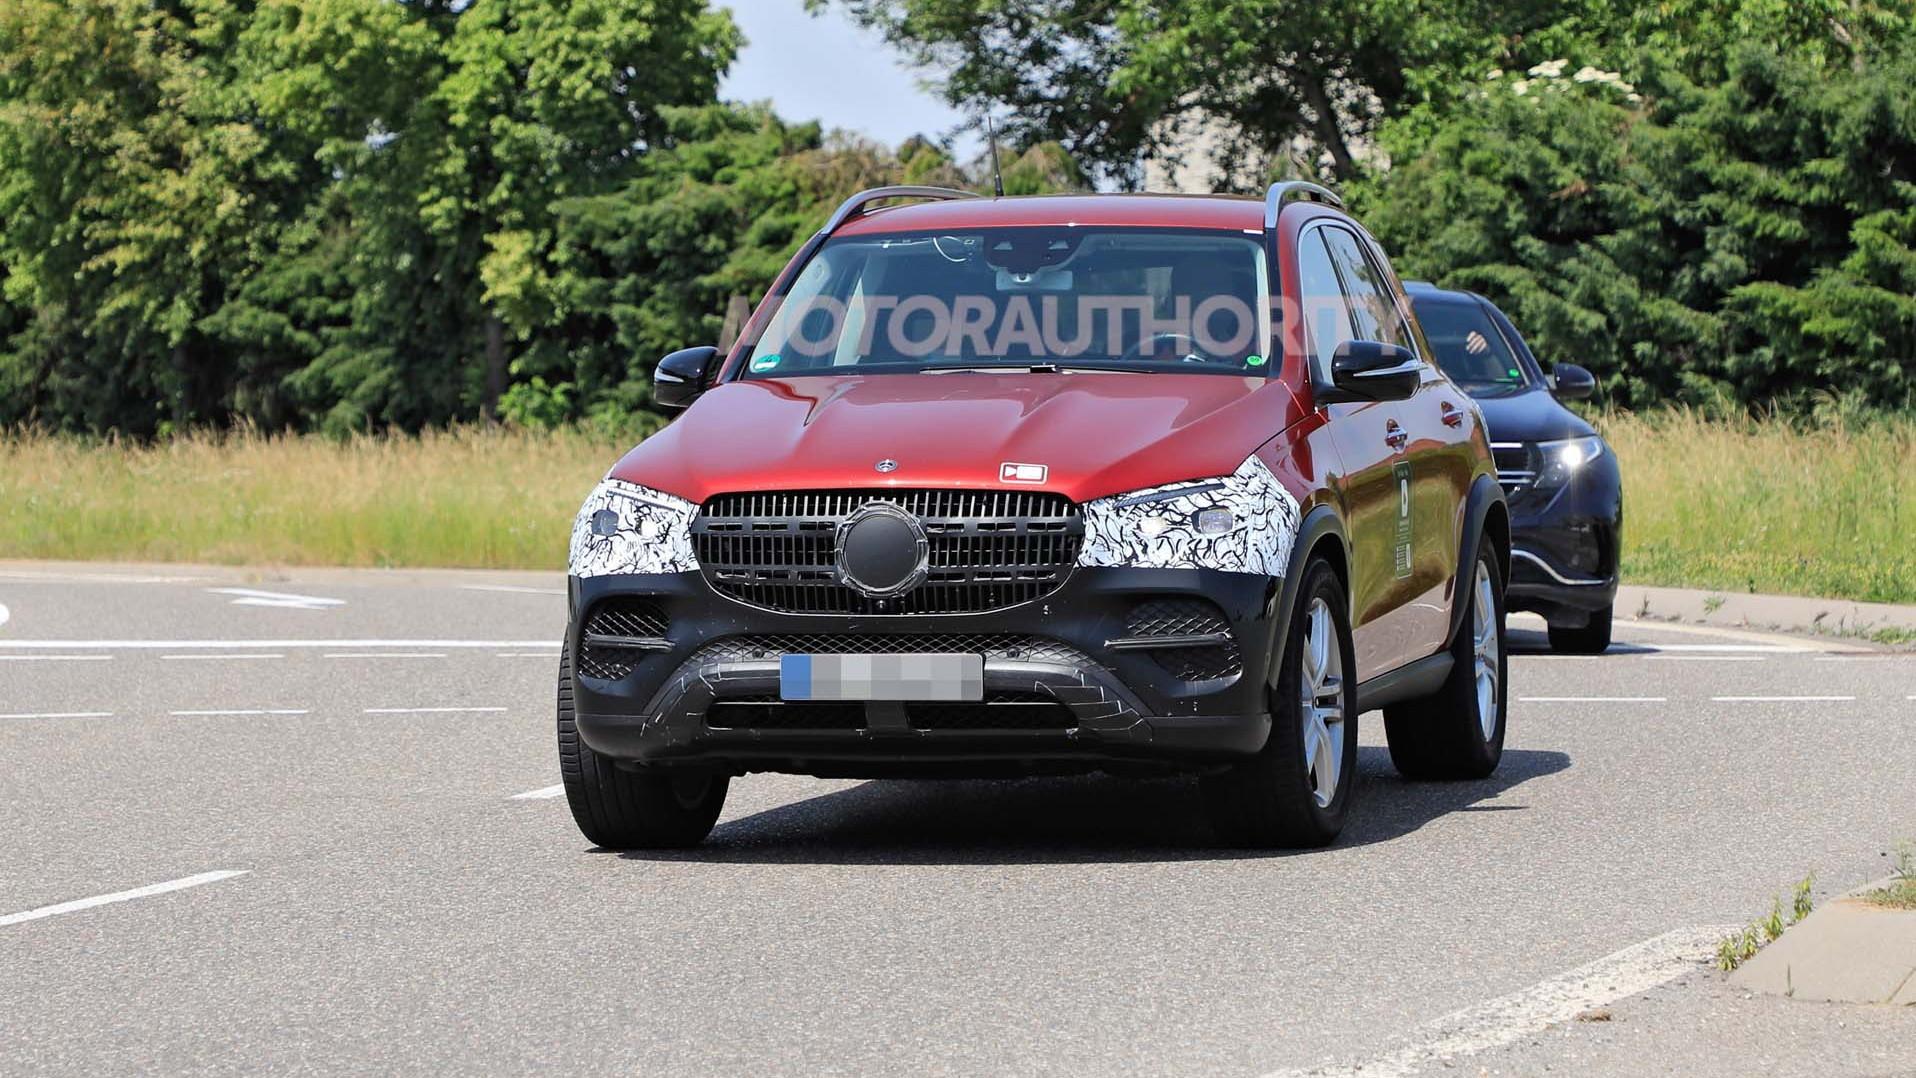 2022 Mercedes-Benz GLE-Class spy shots - Photo credit: S. Baldauf/SB-Medien